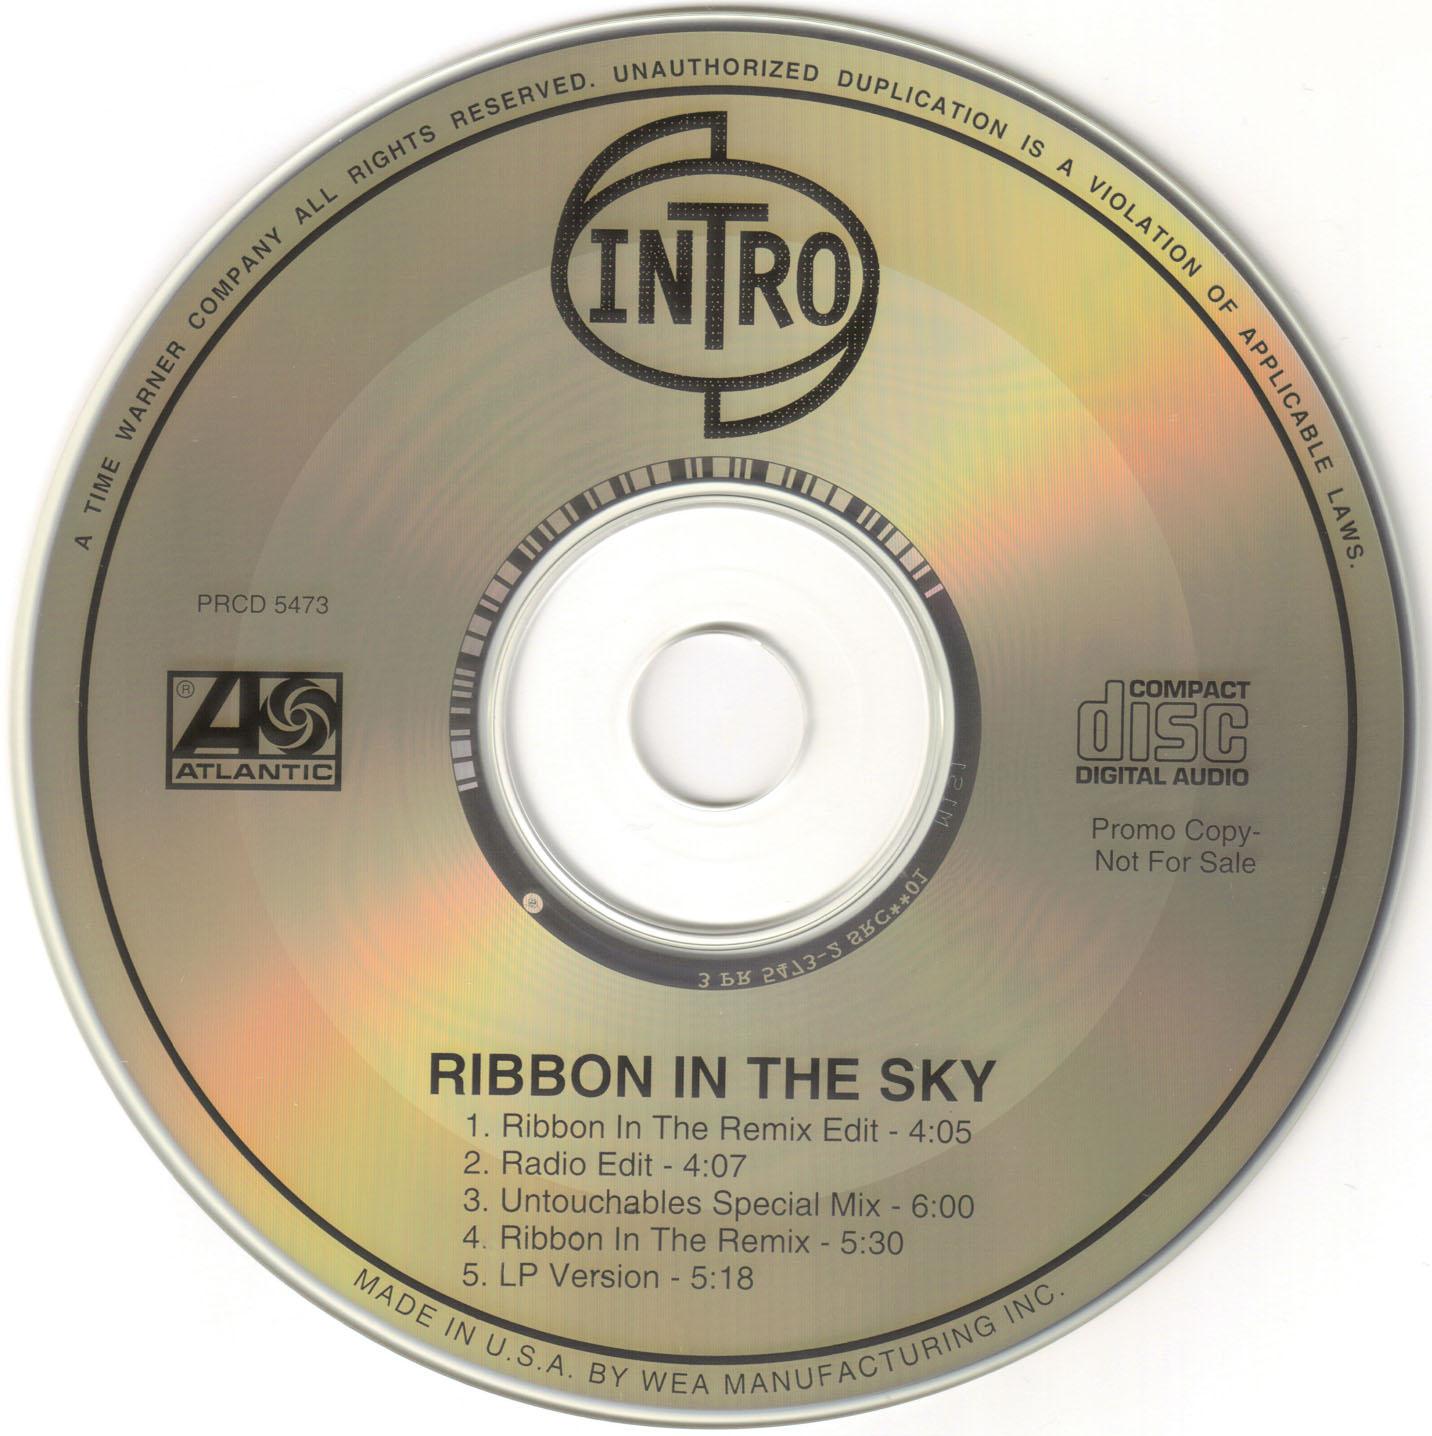 Sky No Keysystem/Cdm Available